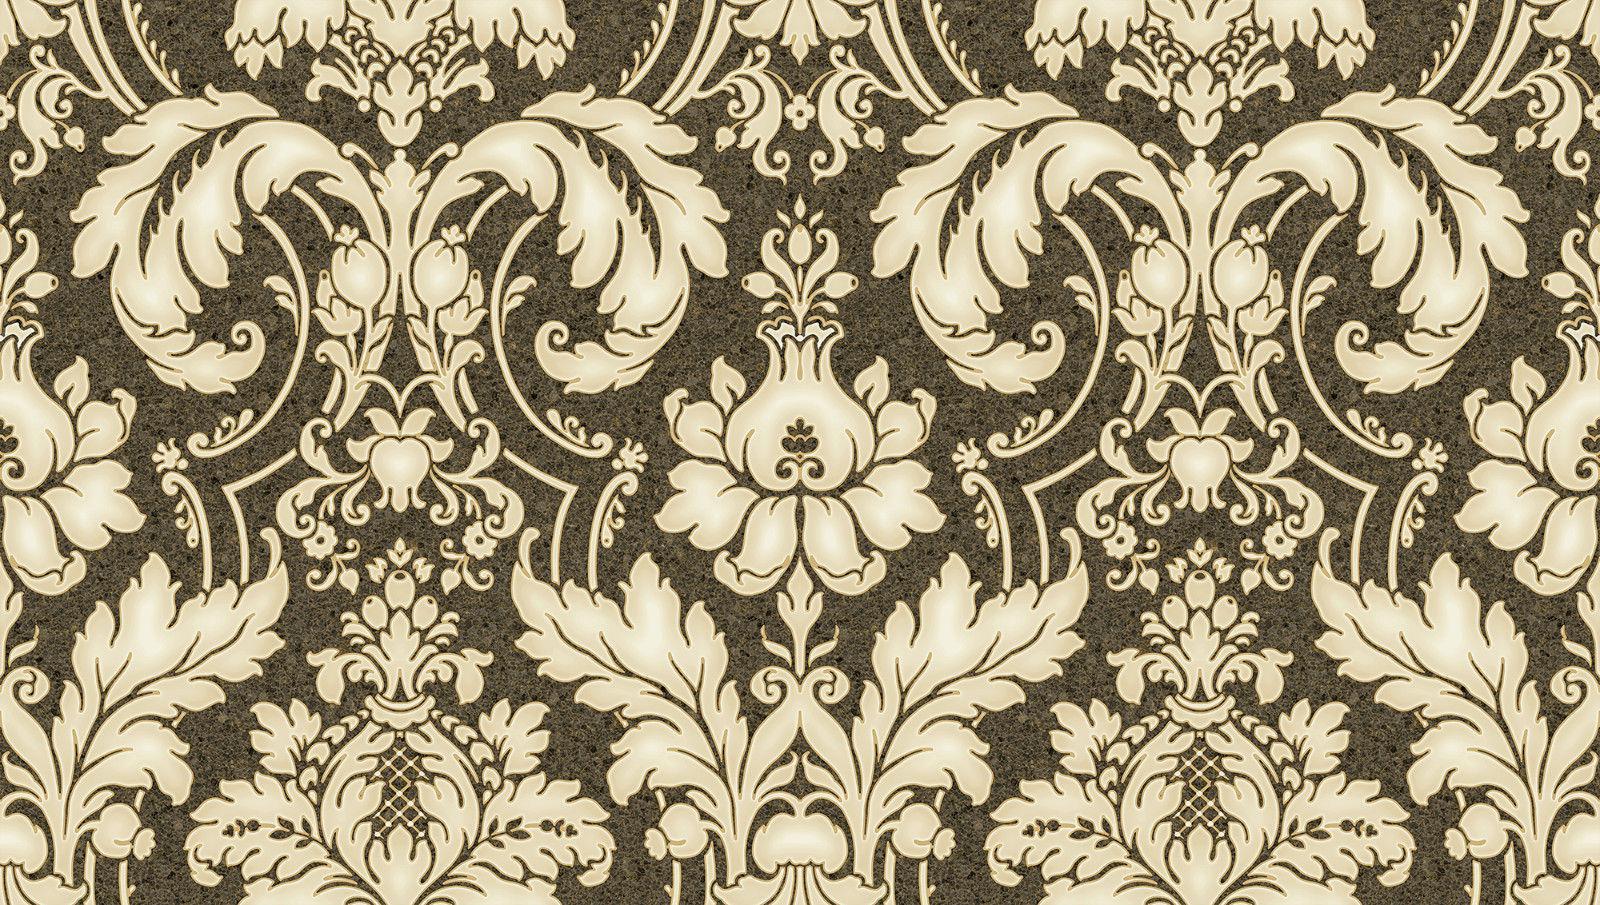 Barock Tapete Schwarz. retro barock tapete black white 5526 31 ...